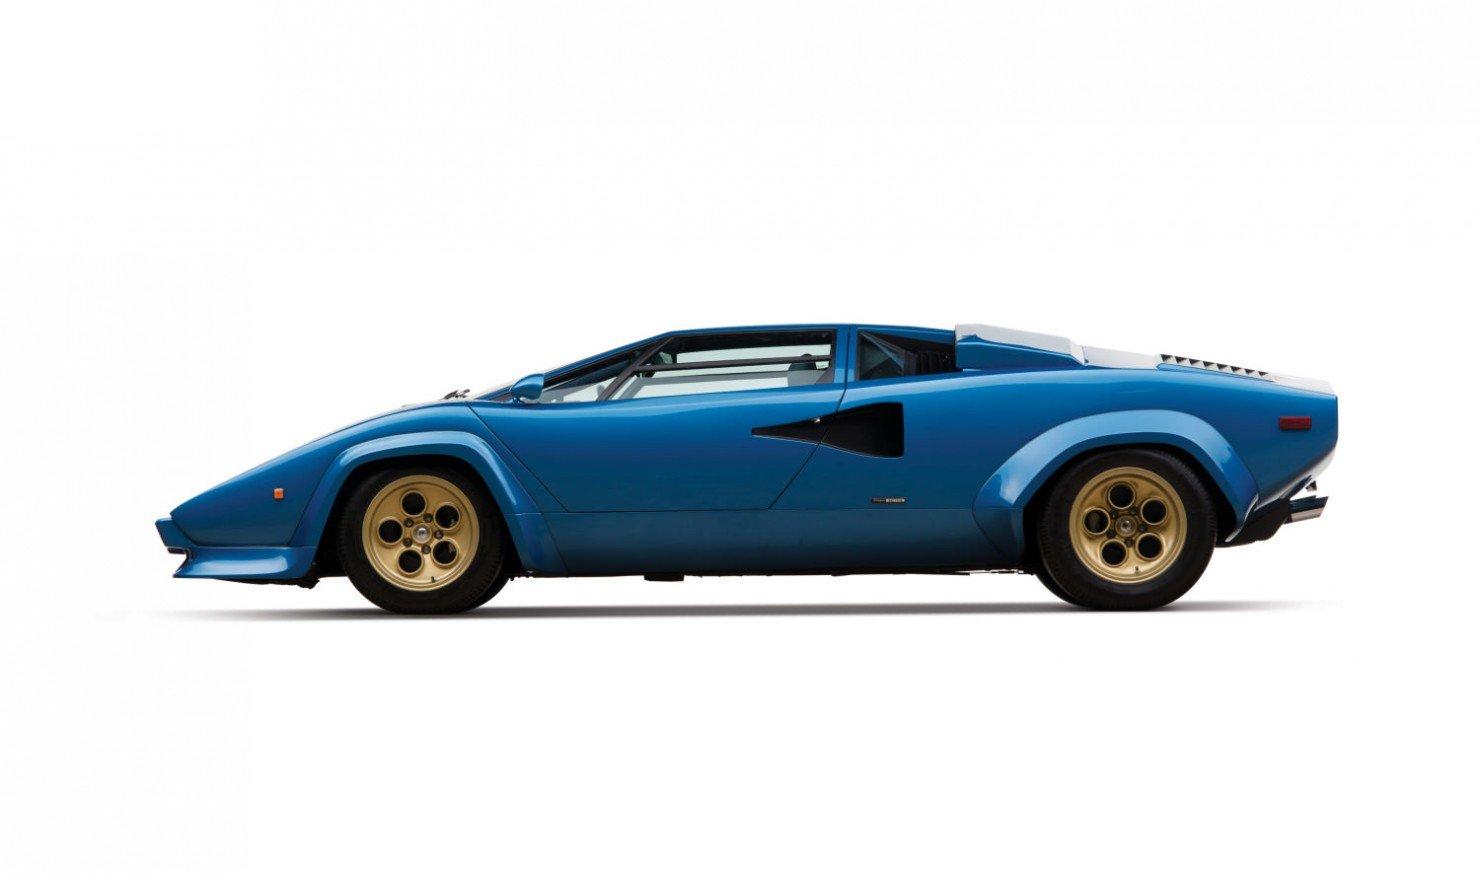 Lamborghini-Countach-LP400S-5